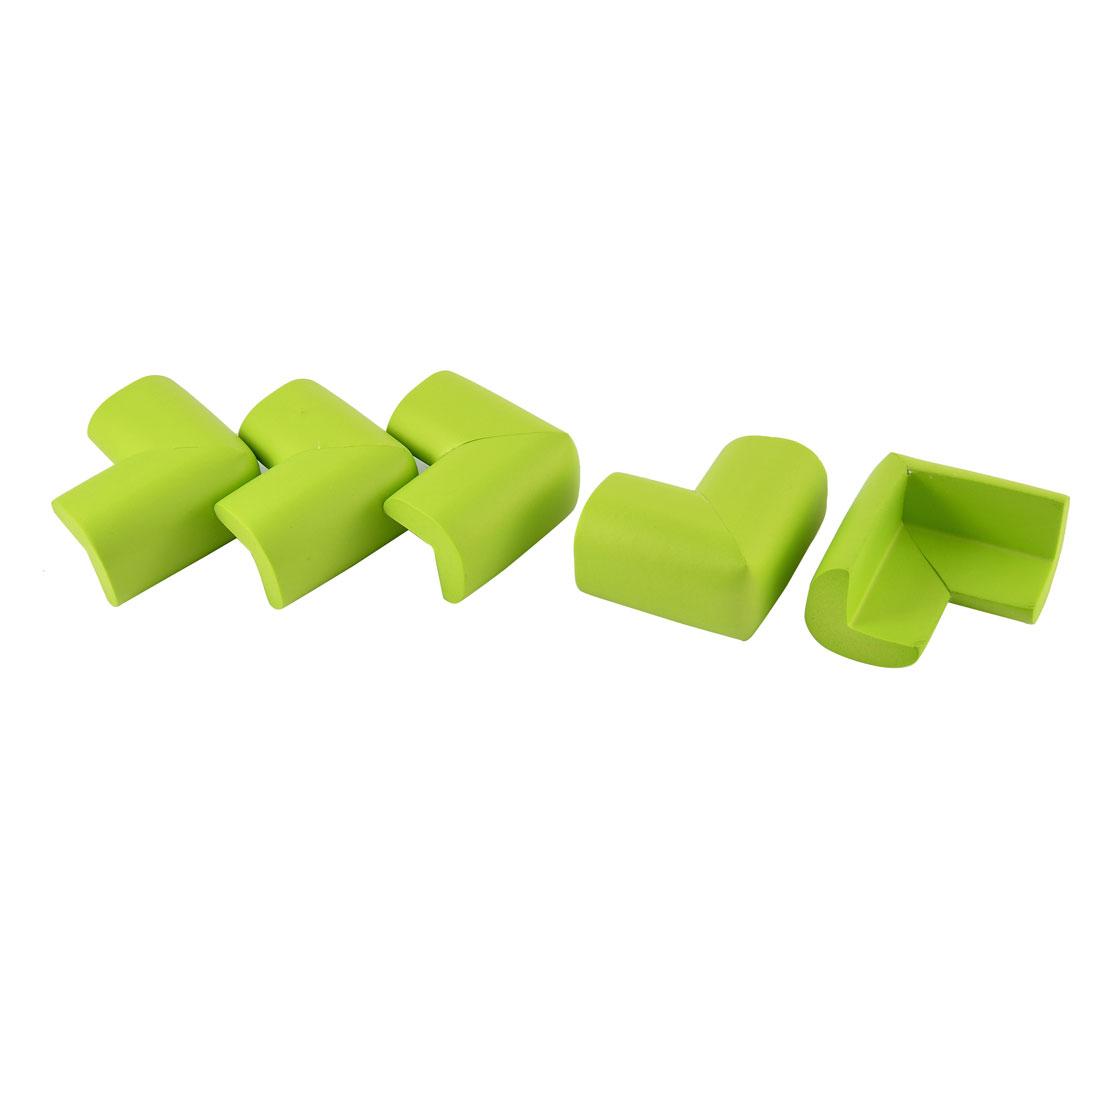 L Shape Safety Protector Furniture Corner Edge Guard Cushion Green 5 Pcs